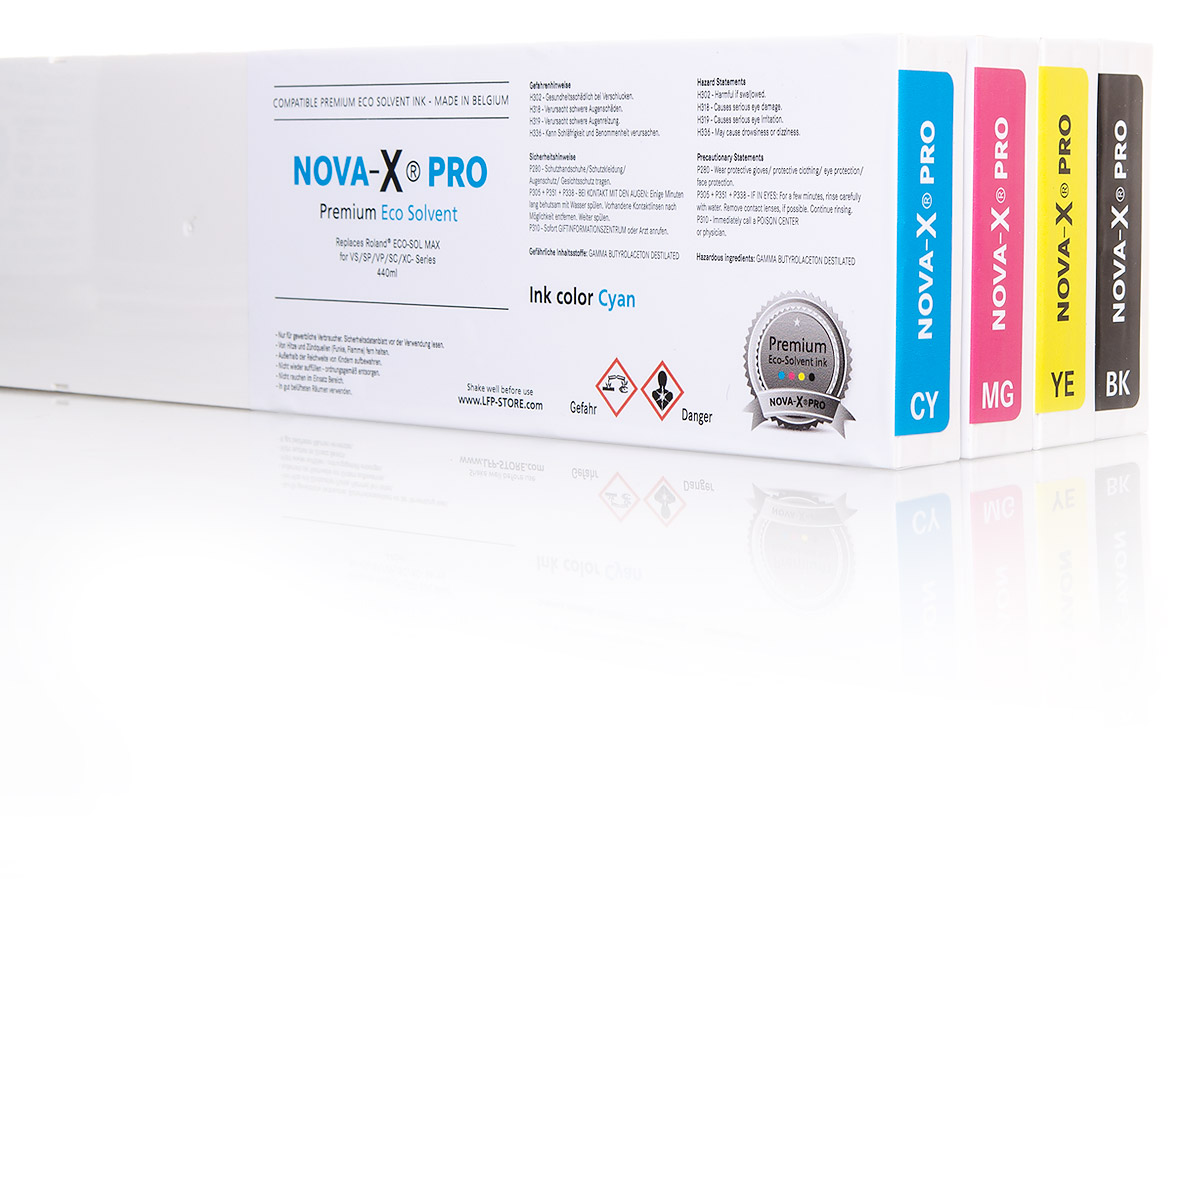 4x NOVA-X® PRO Tintenpatrone Eco-Solvent für Roland® | 440ml | OEM Farbanpassung